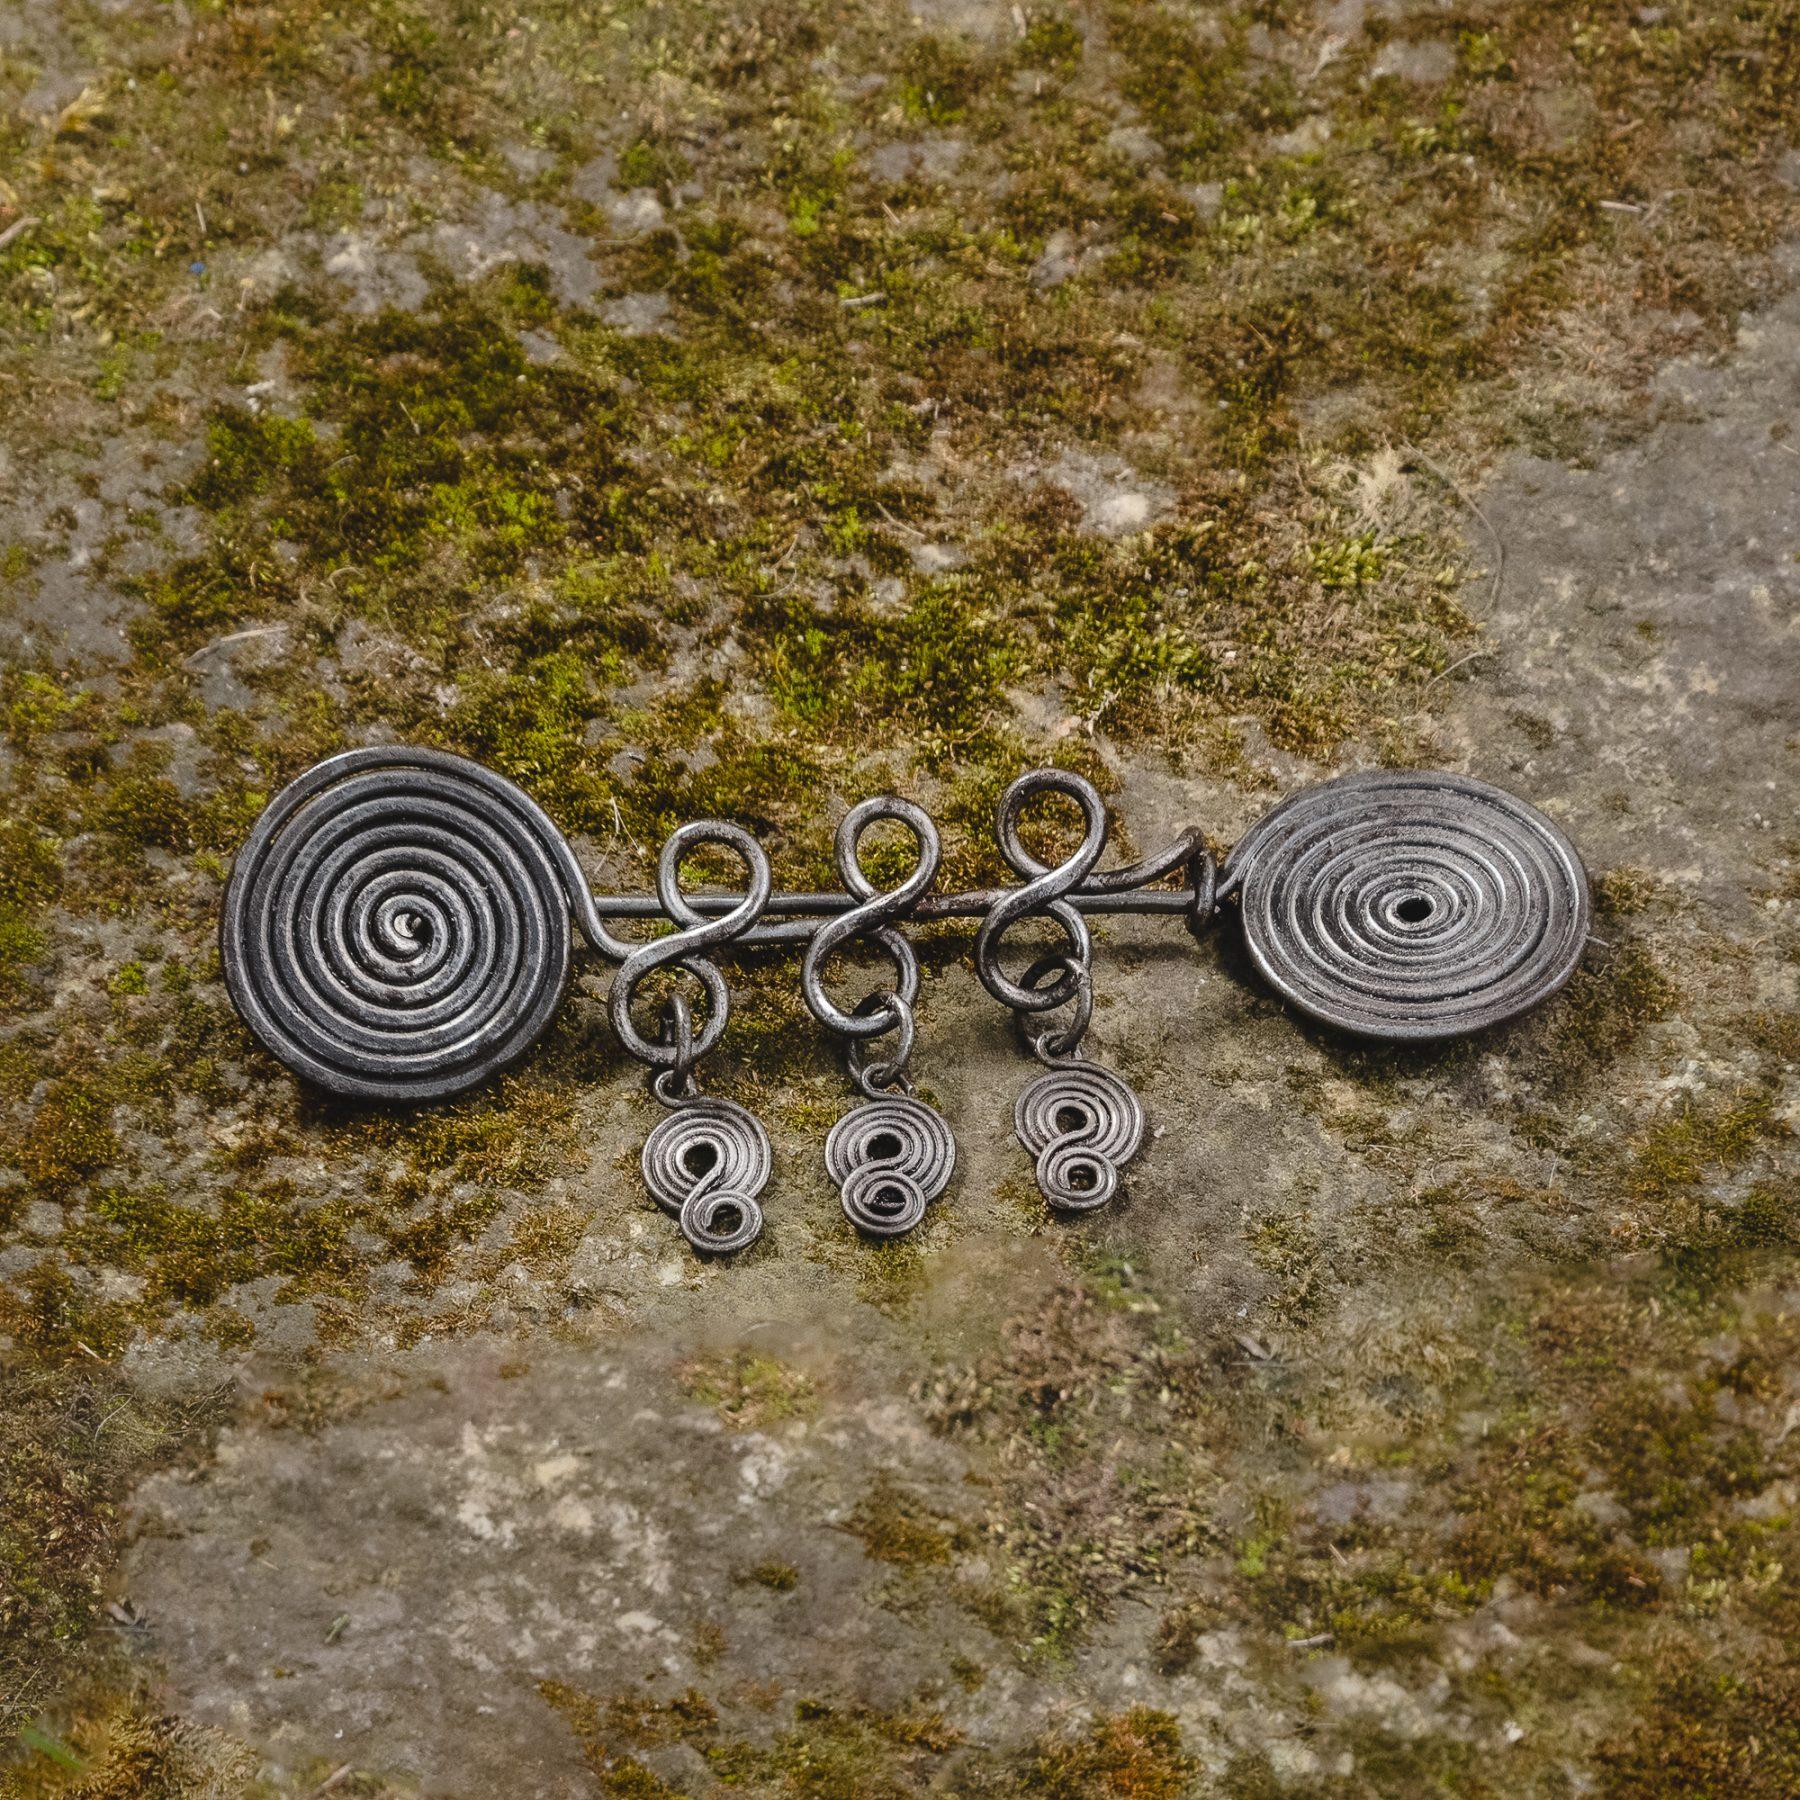 Iron Age Cloak Pin (Fibula) II